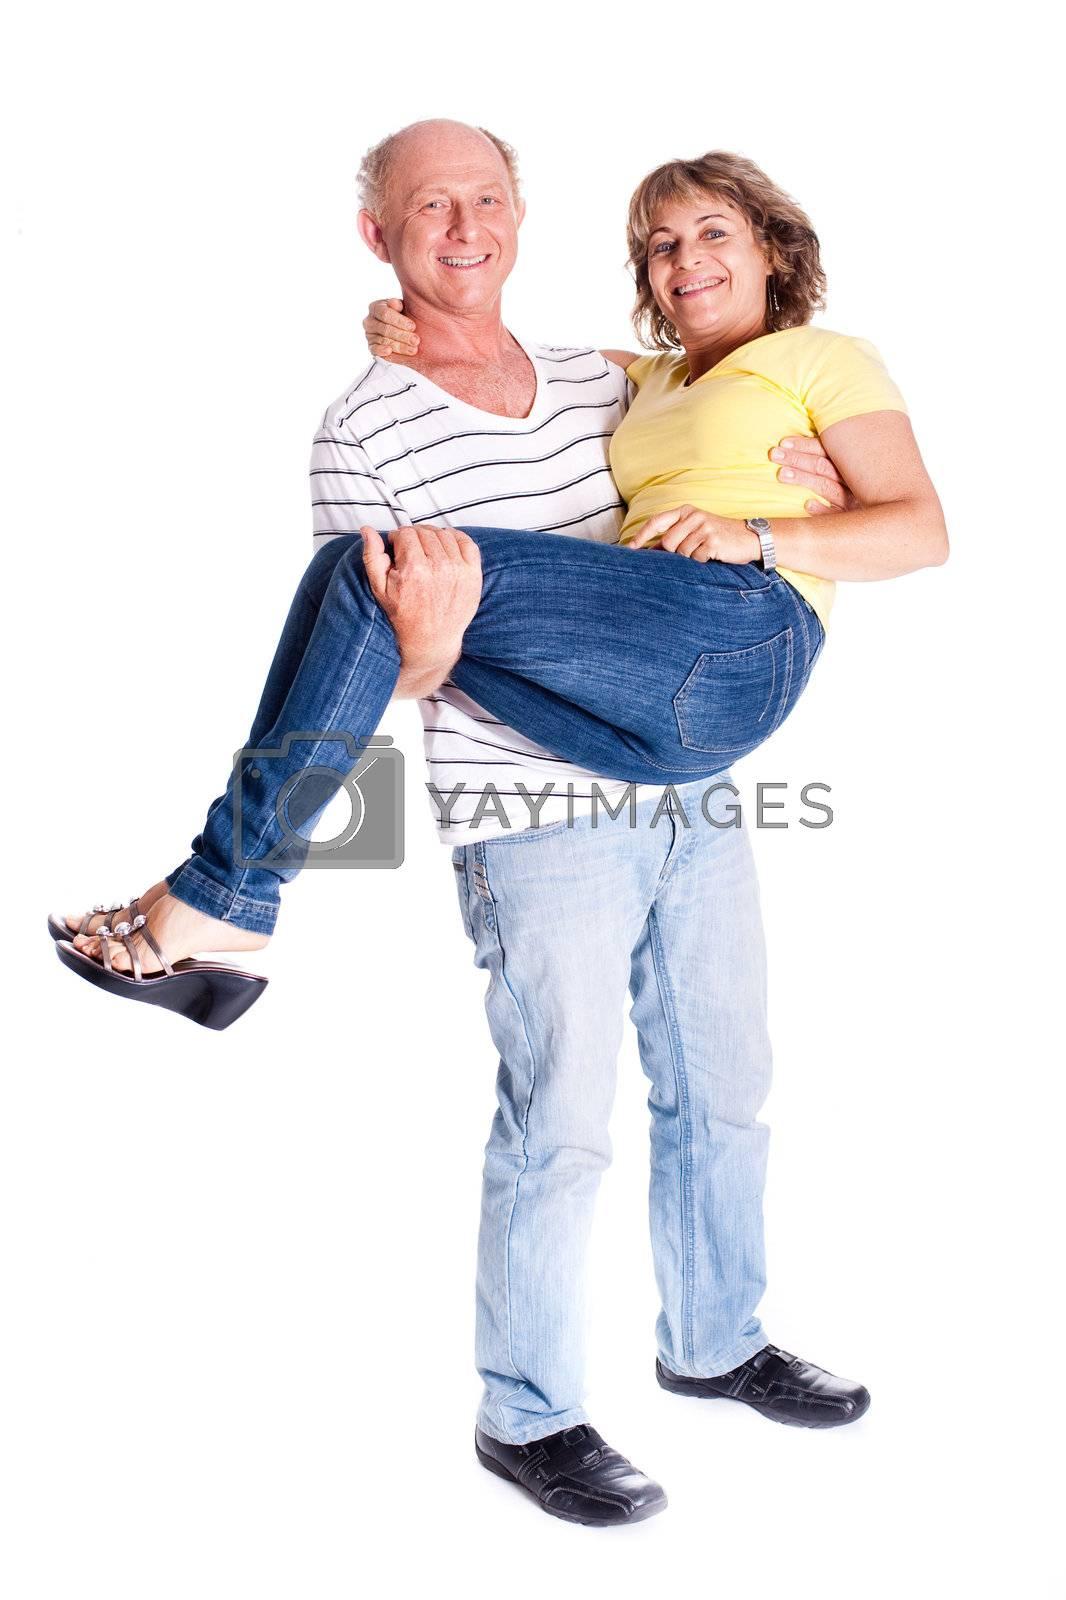 Playful senior couple having fun indoors isolated over white background...